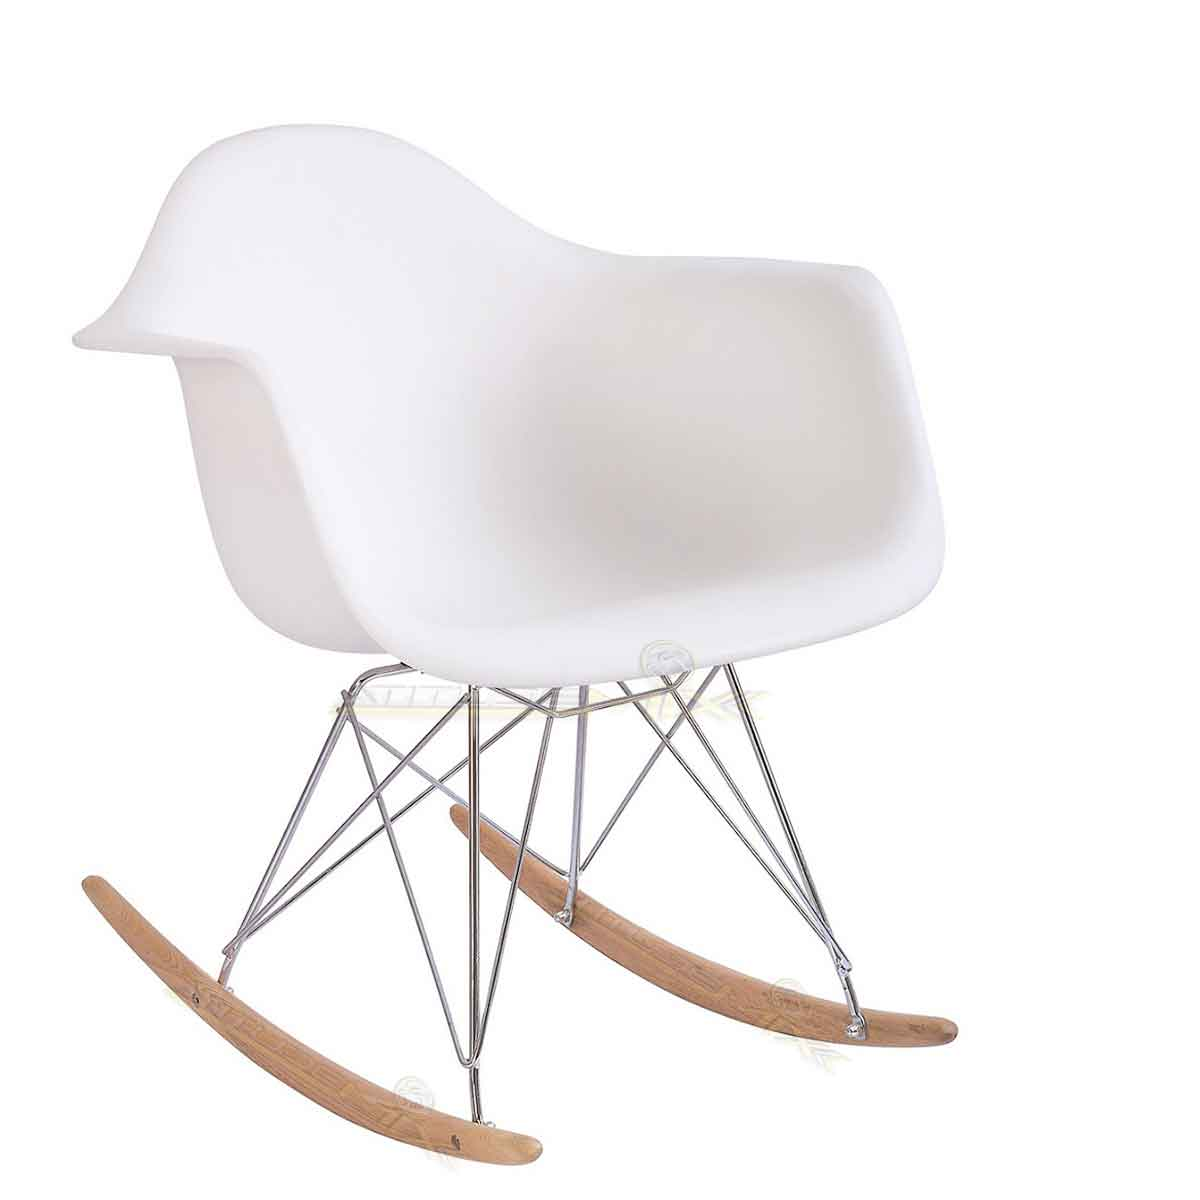 Cadeira Poltrona De Balanço Charles Eames Design Branca Daw